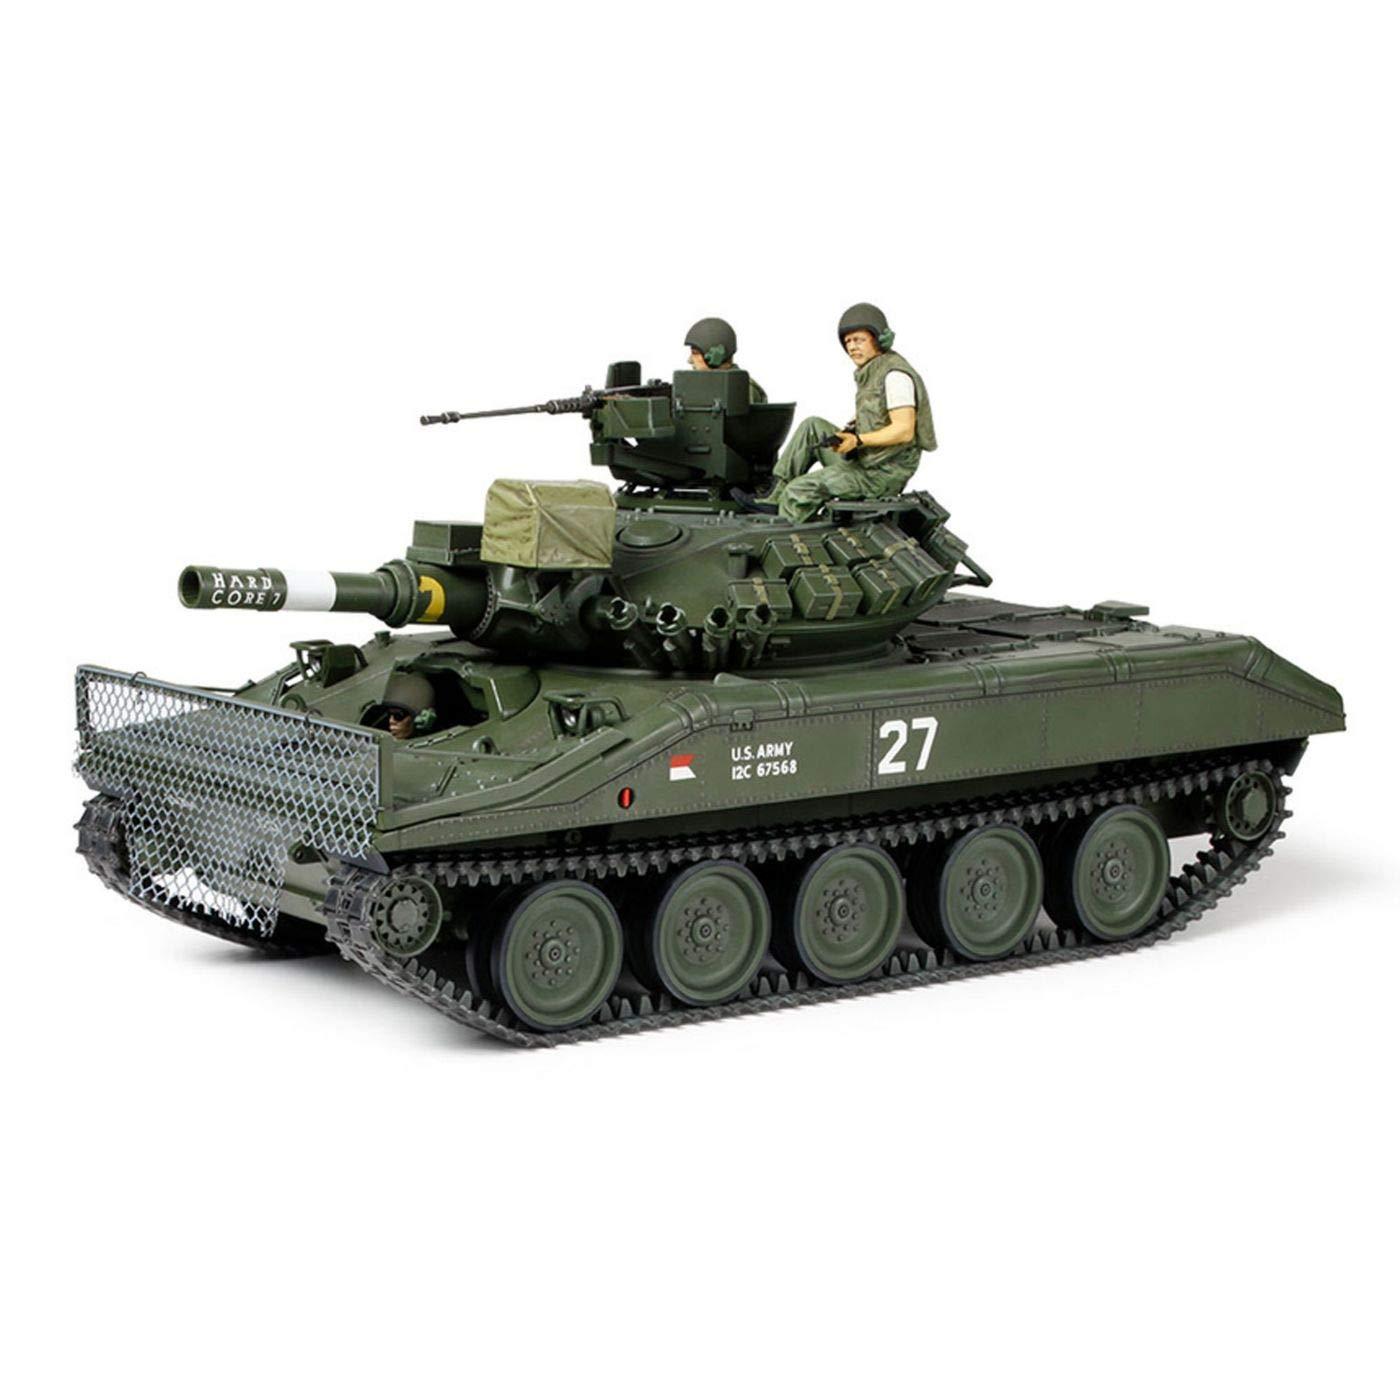 Tamiya America, Inc 1 35 U.S. Airborne Tank M551 Sheridan Vietnam War, TAM35365